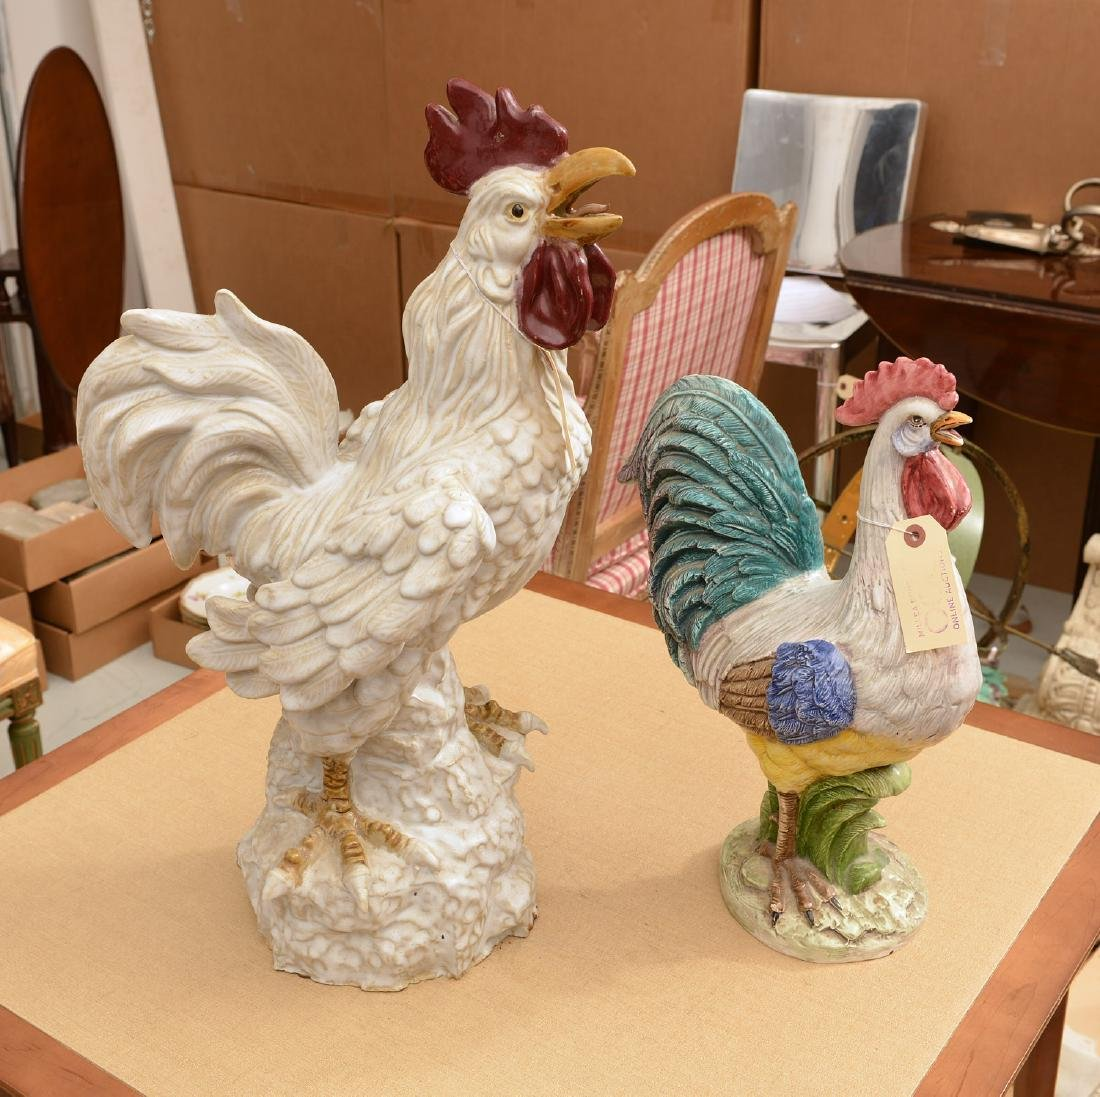 (2) large Italian ceramic rooster figures